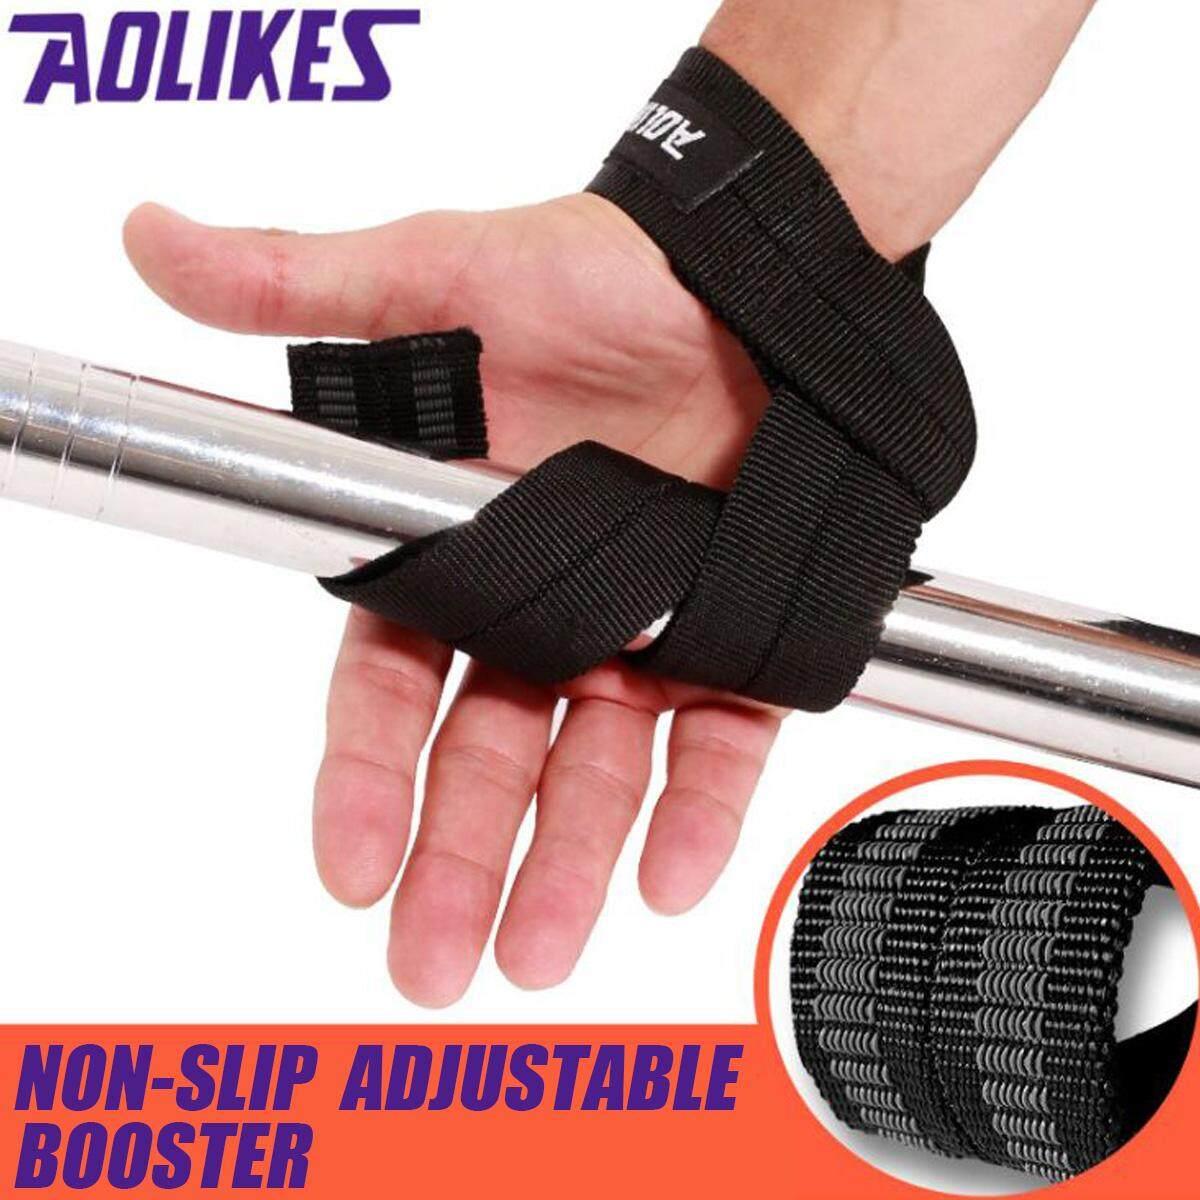 Batangan Angkat Berat Genggaman Tali Pergelangan Tangan Penopang Gym Latihan Wraps Sarung Tangan Perban-Hitam